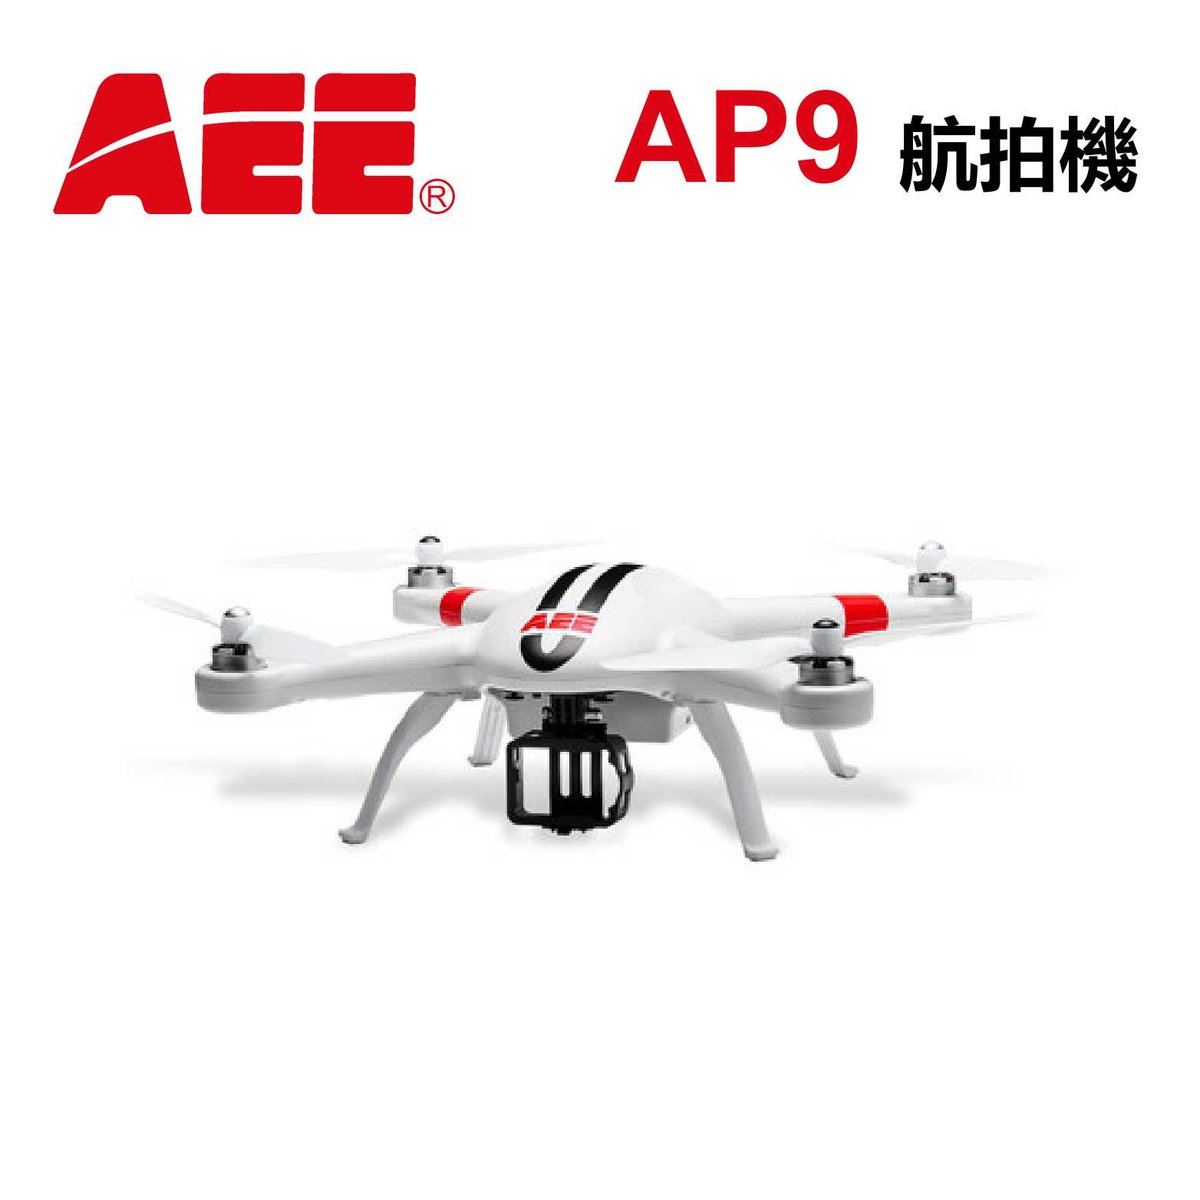 AP9 TORUK QUADCOPTER DRONE (Model: AP9)